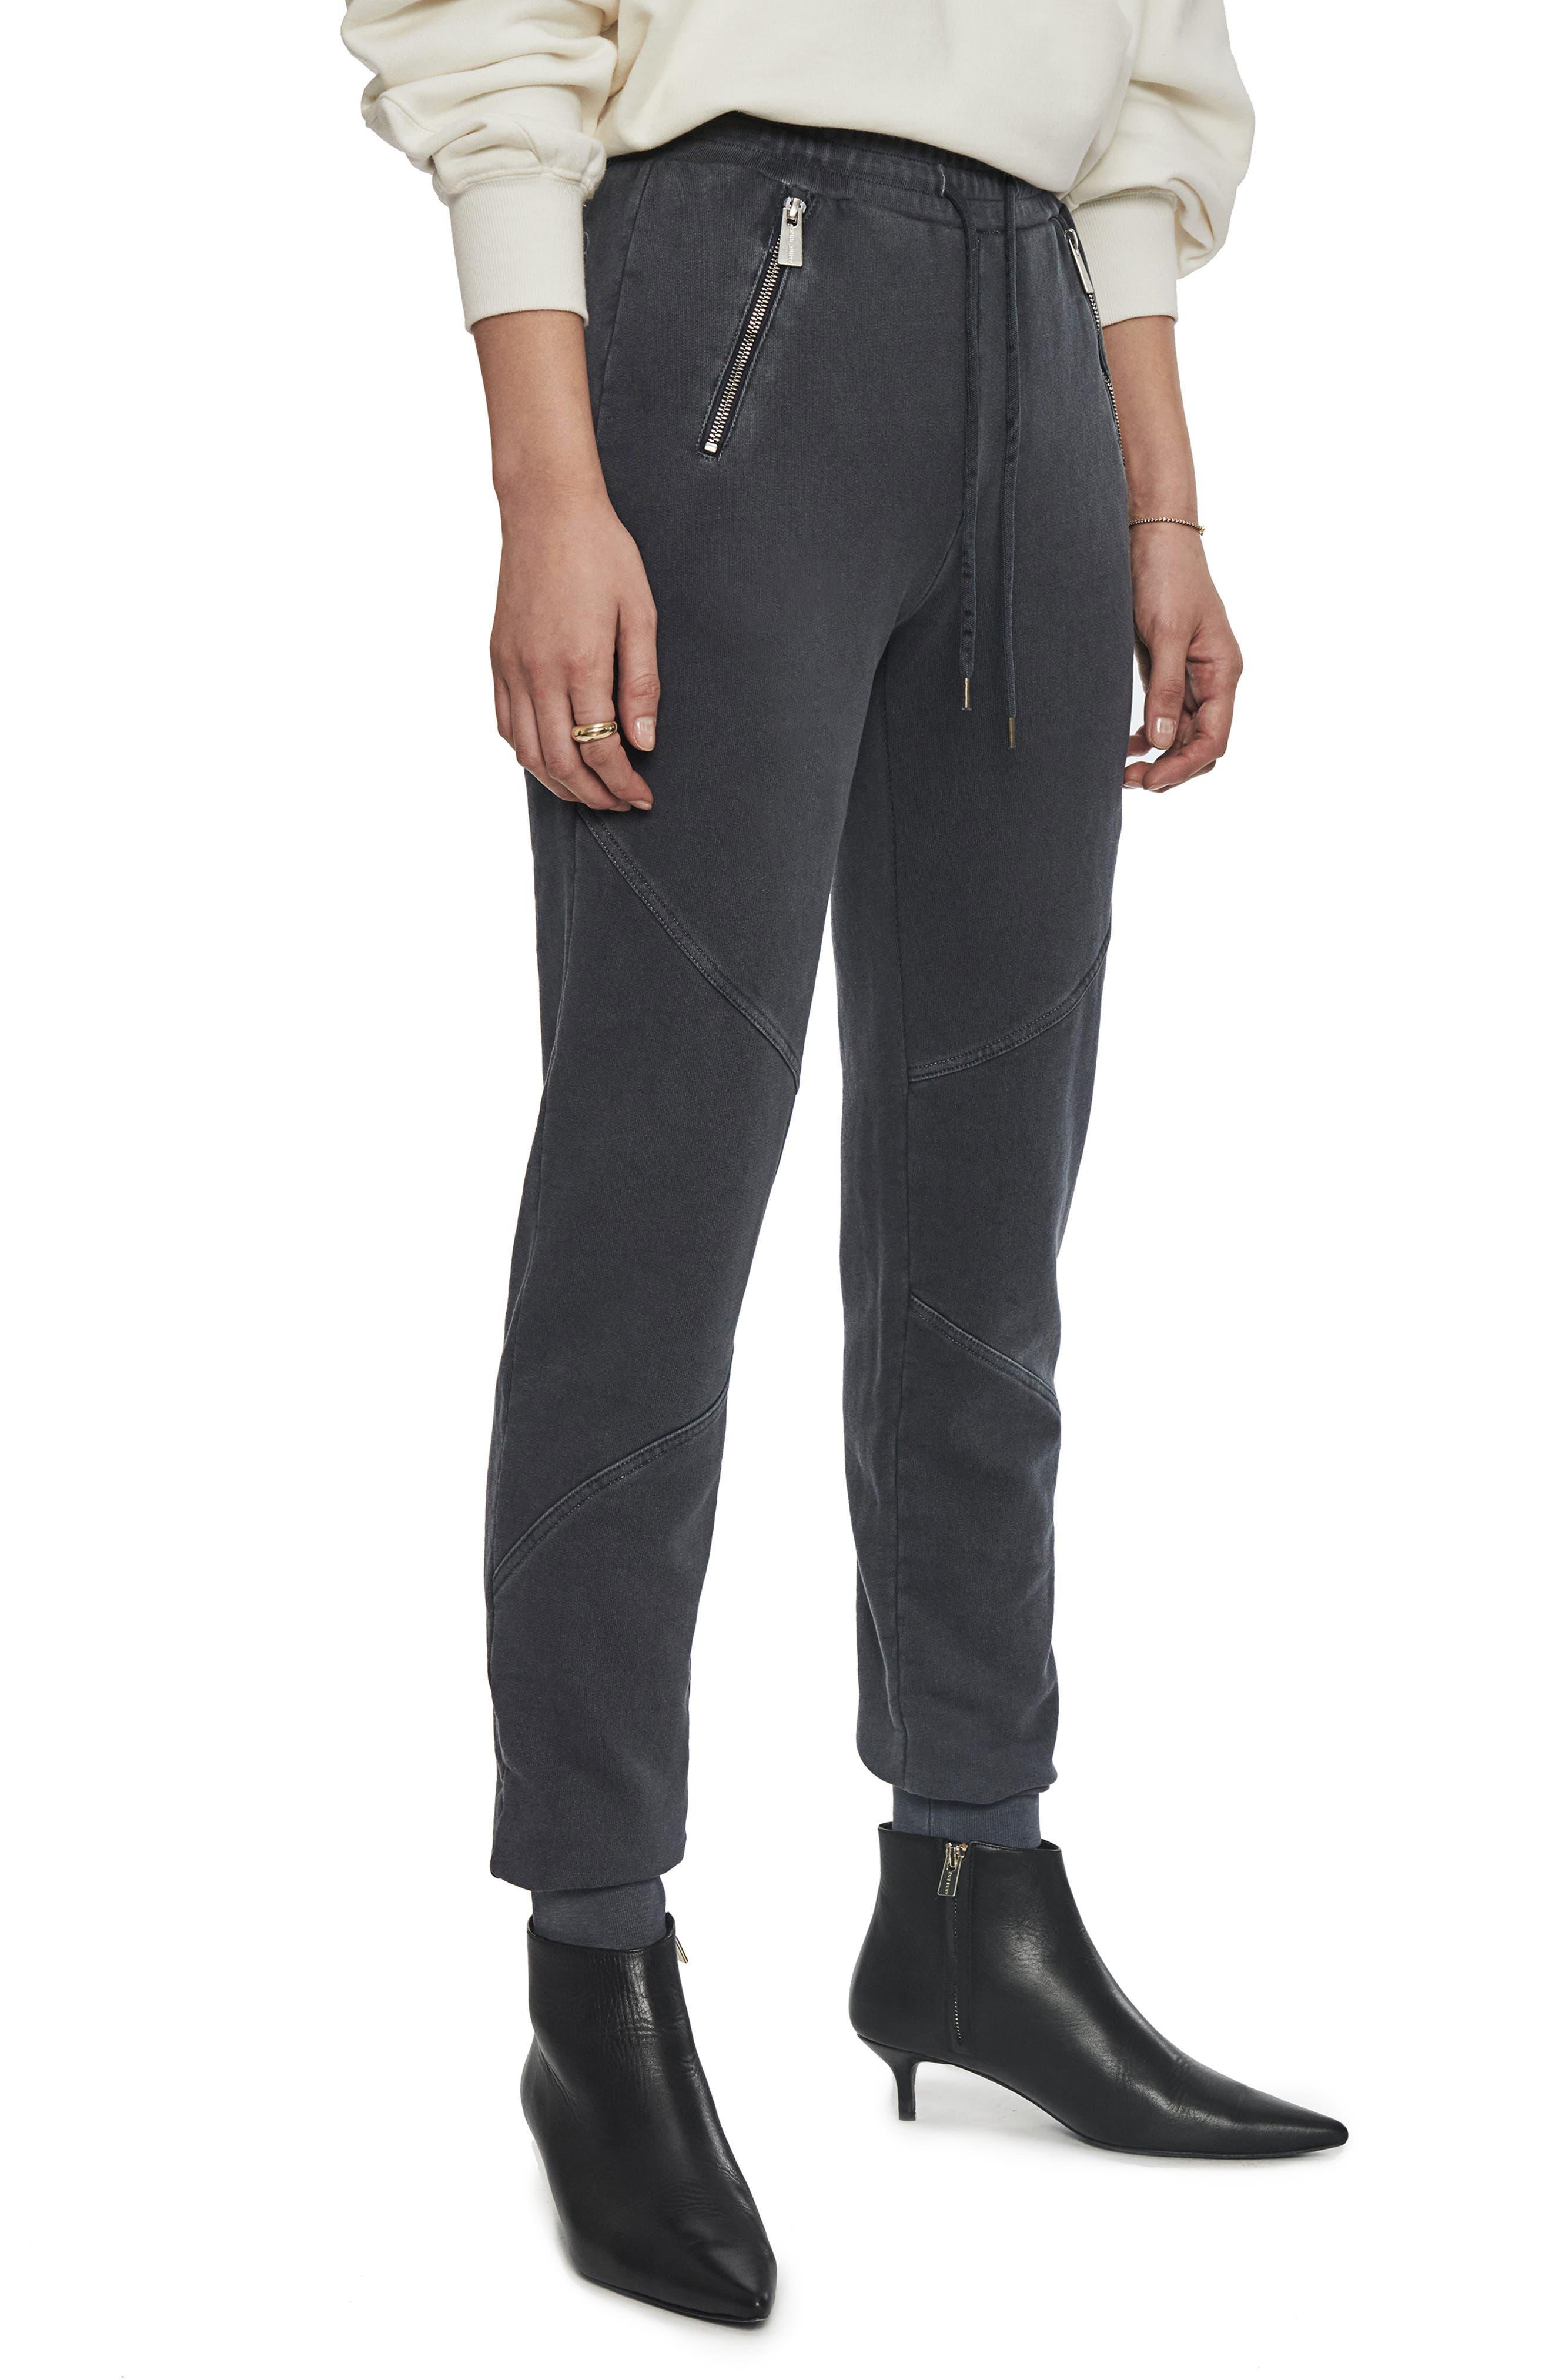 Women's Anine Bing Colette Zip Pocket Cotton Jogger Pants,  Medium - Black